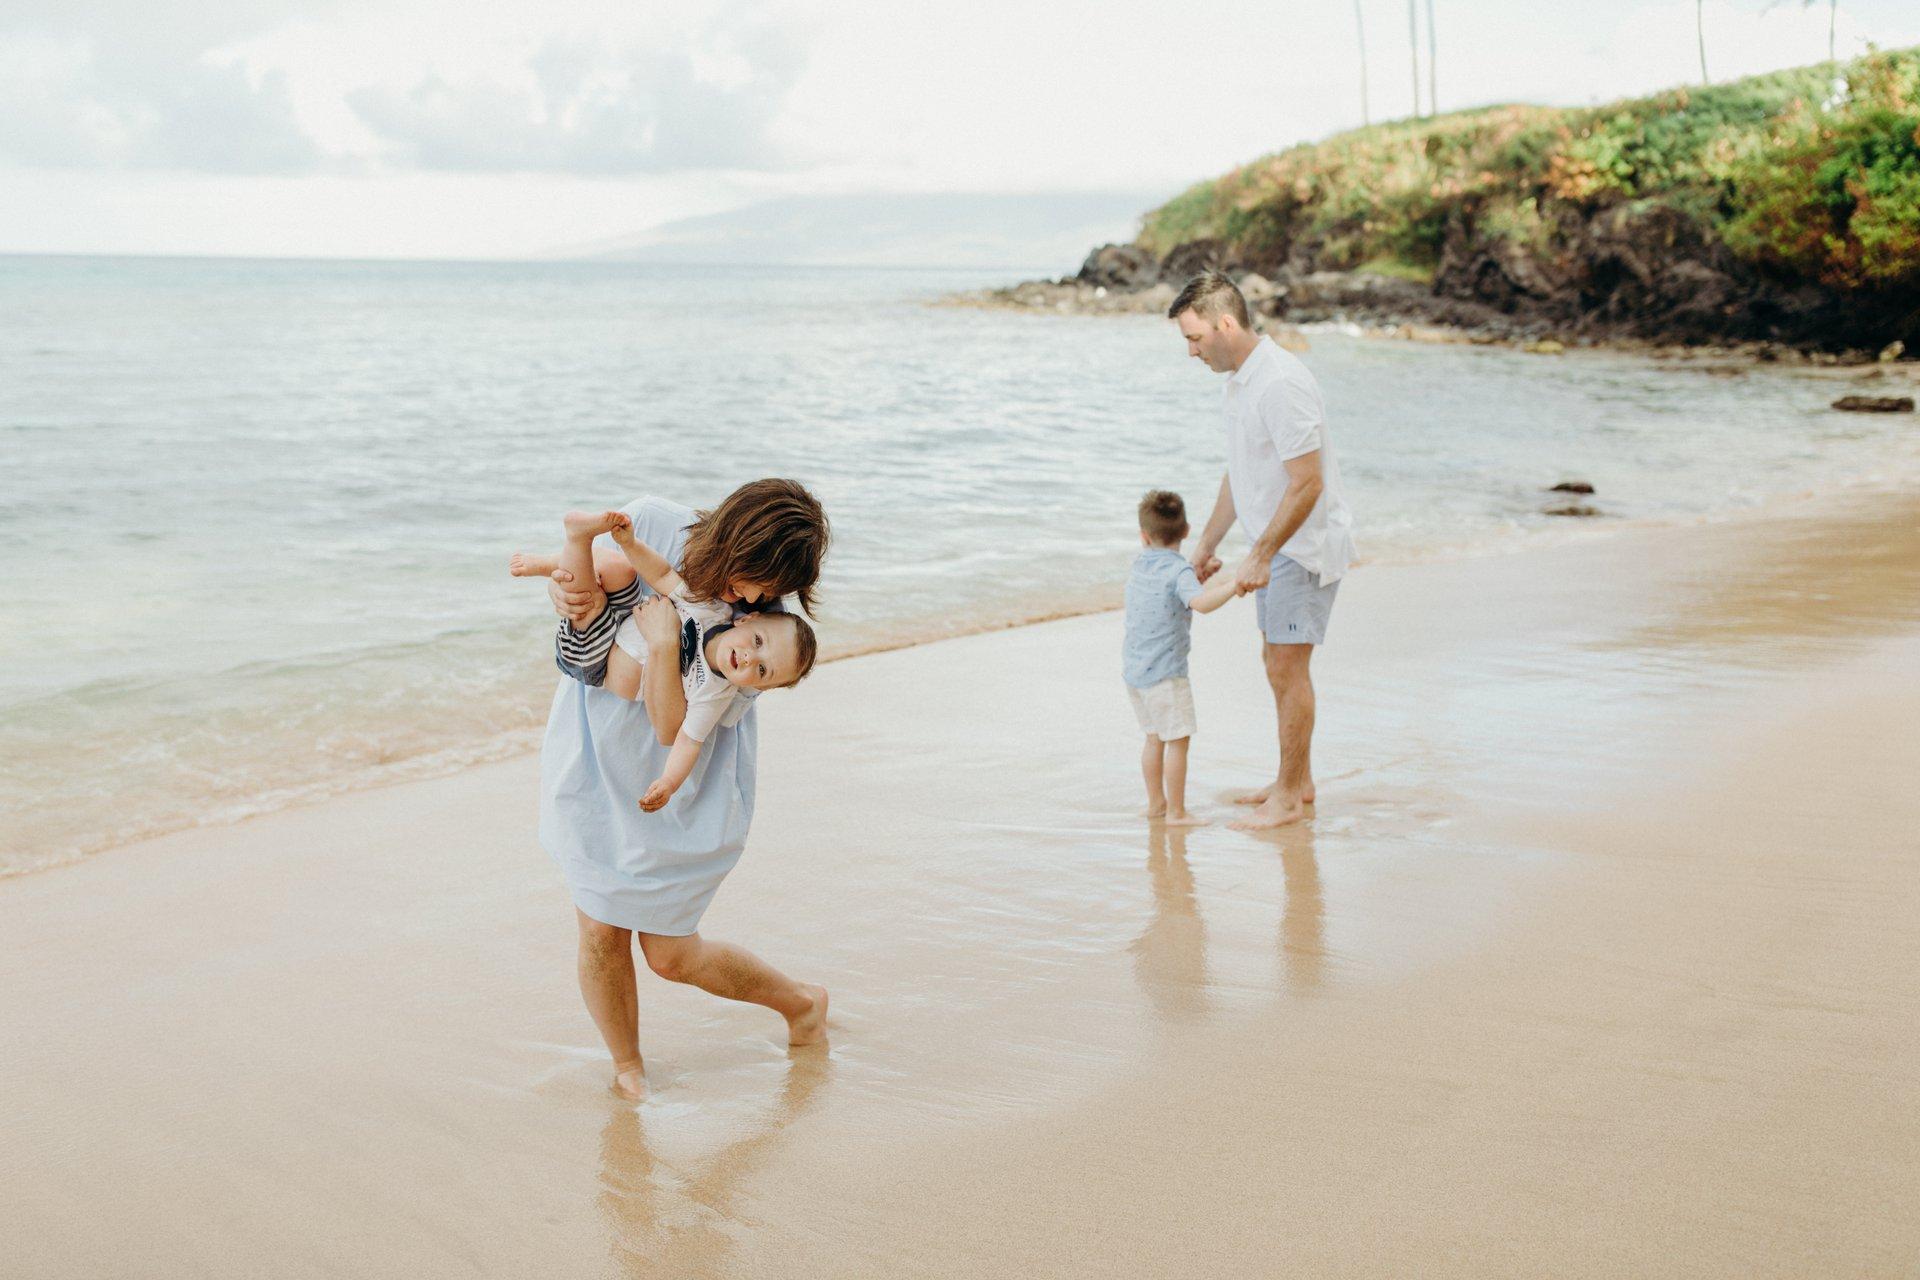 Maui-USA-travel-story-Flytographer-20